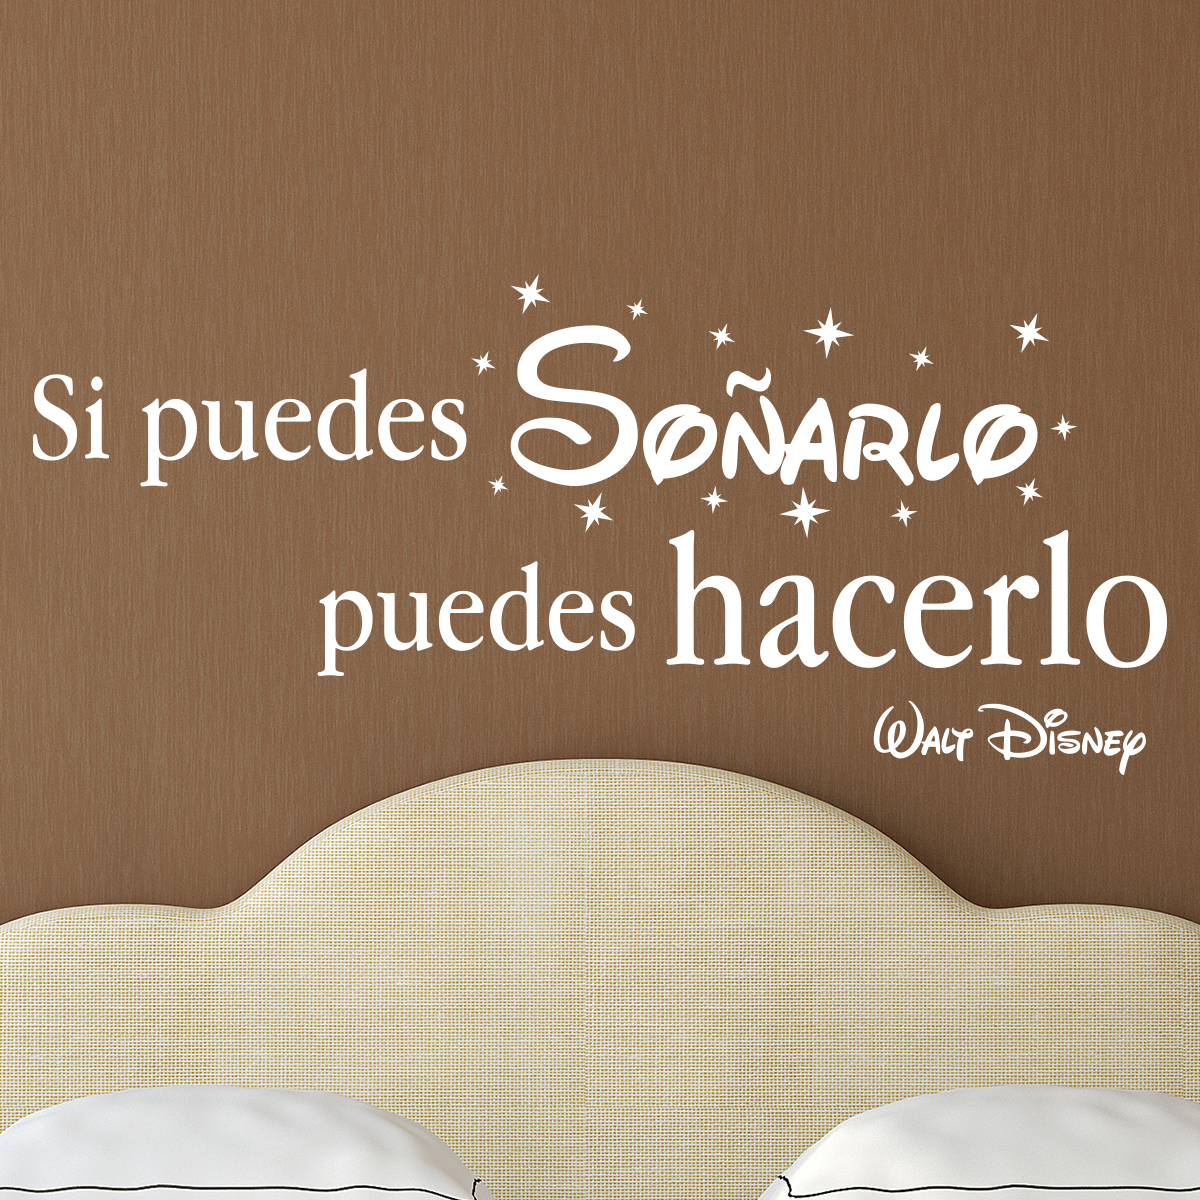 sticker citation si puedes so arlo walt disney stickers citations espagnol ambiance sticker. Black Bedroom Furniture Sets. Home Design Ideas